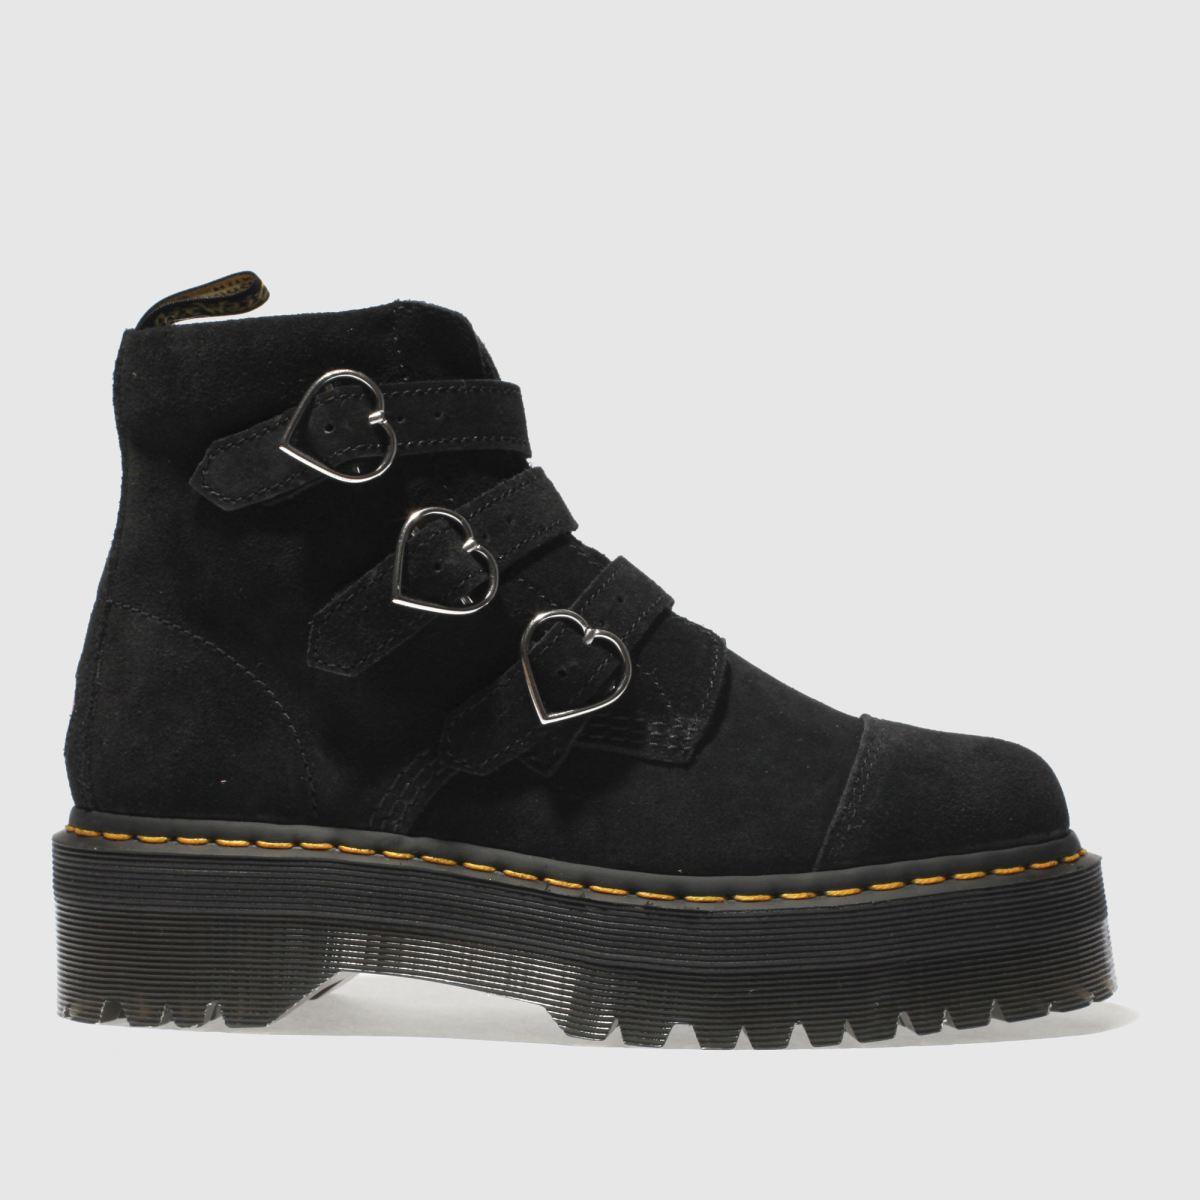 Dr Martens Black Buckle Boot Lazy Oaf Boots